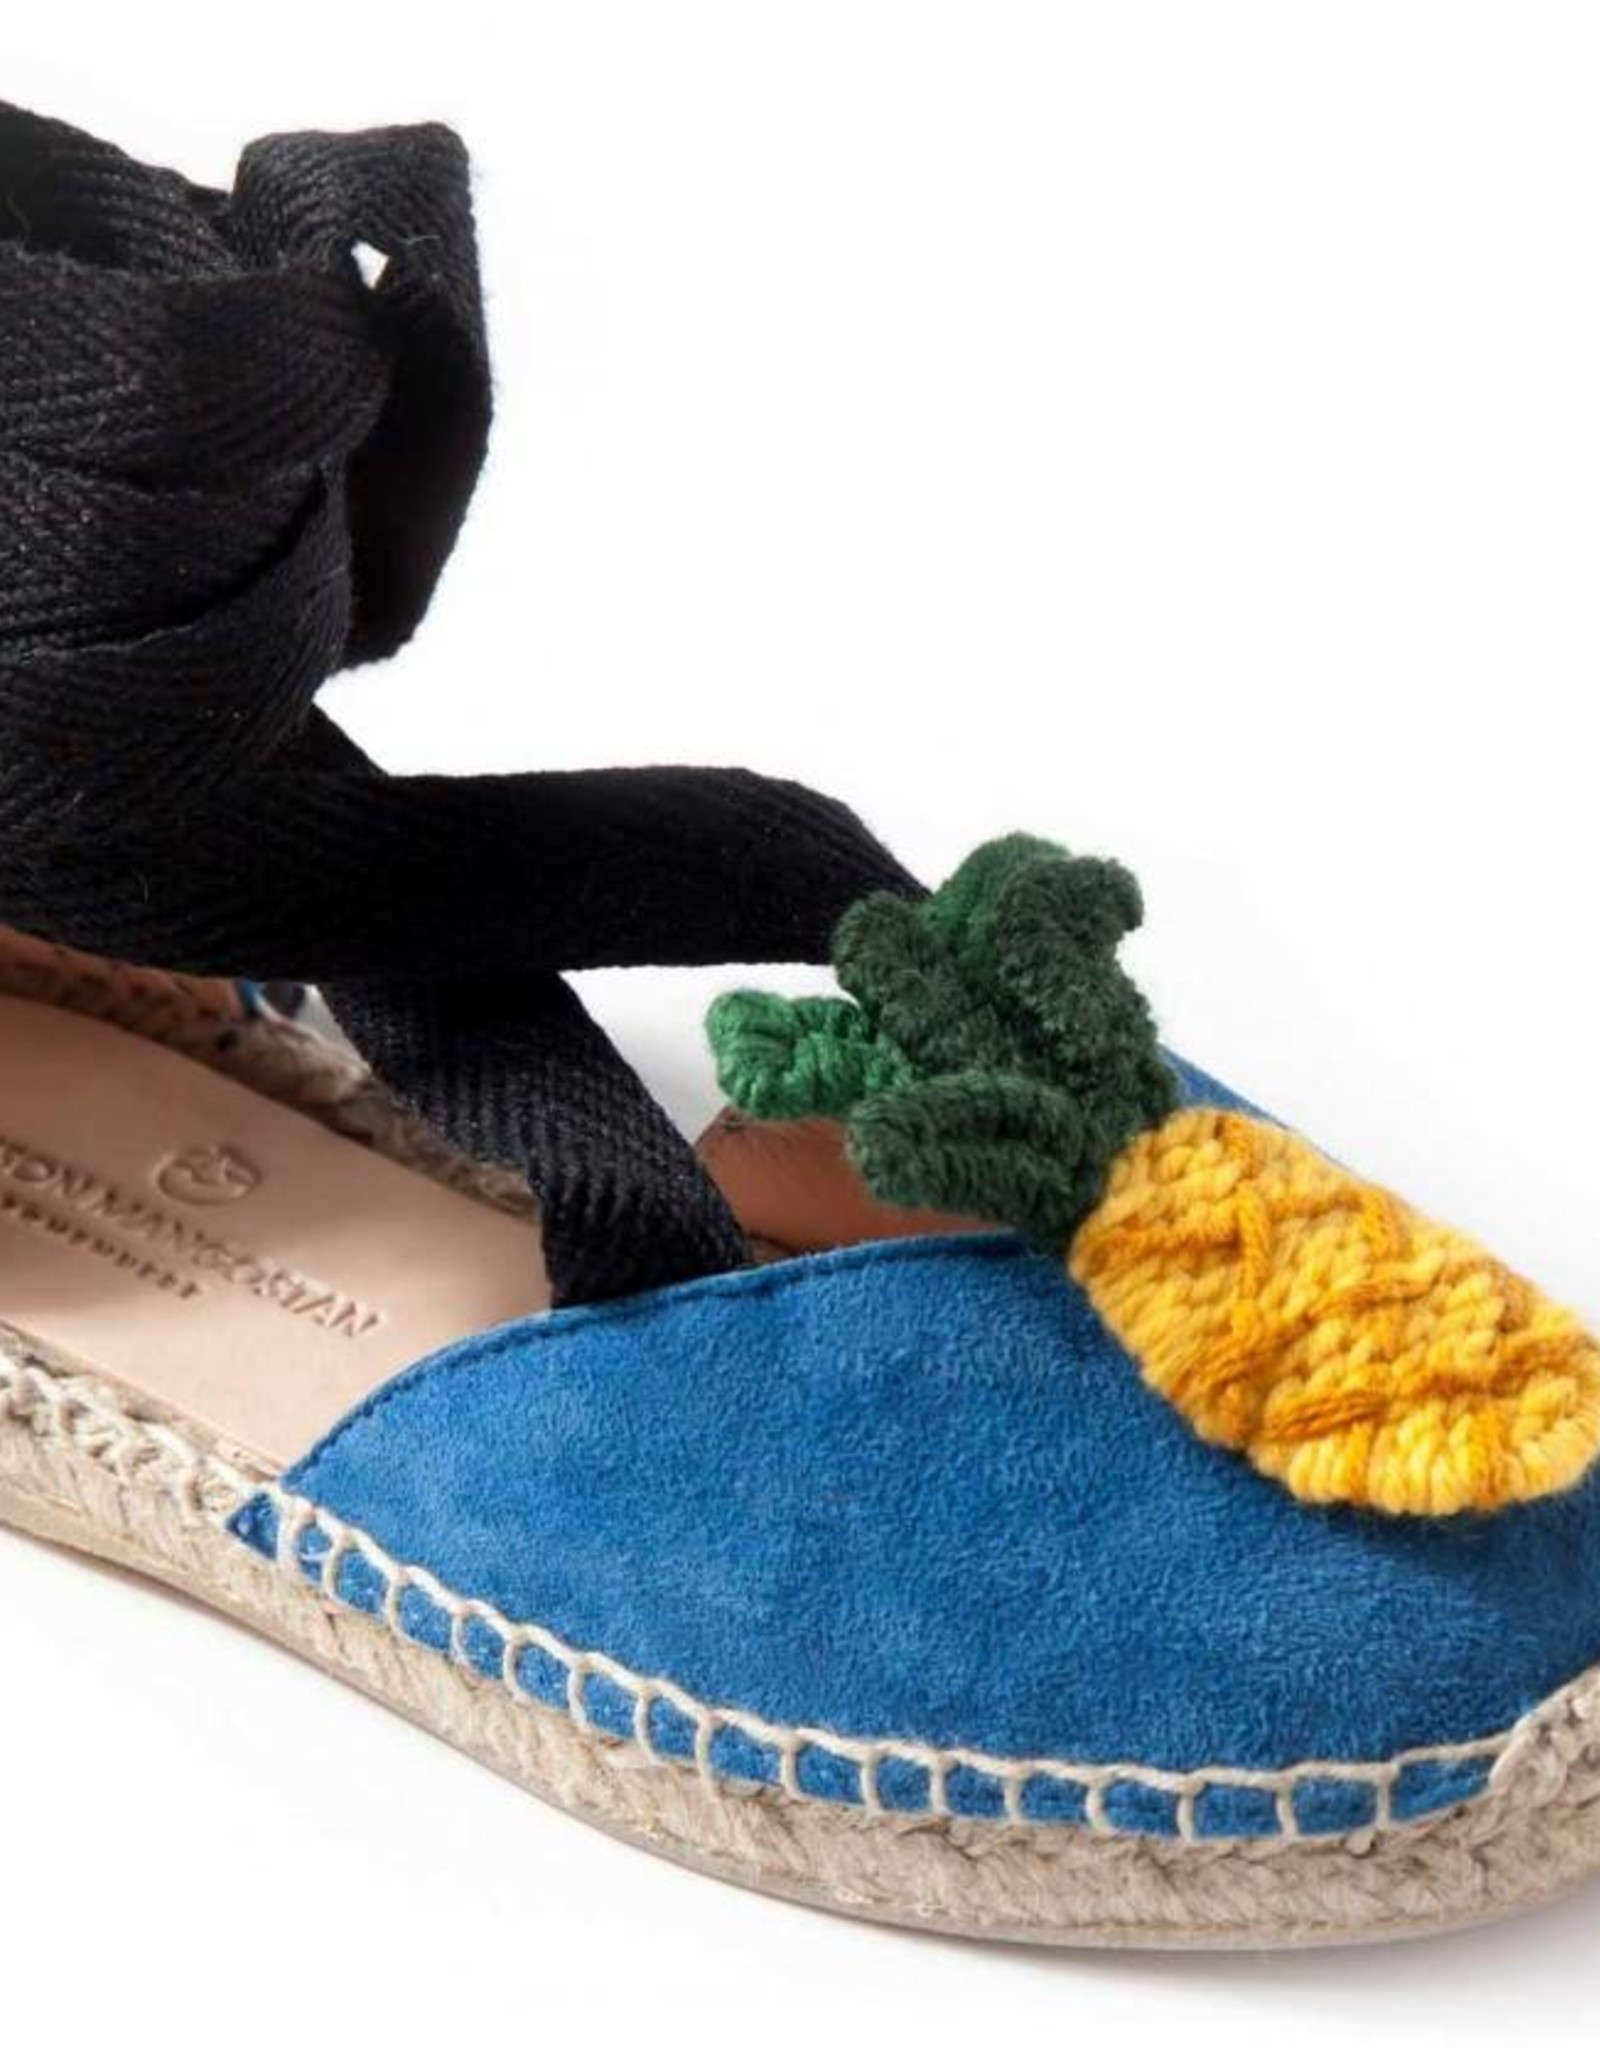 Mini Macedonia pineapple sandals